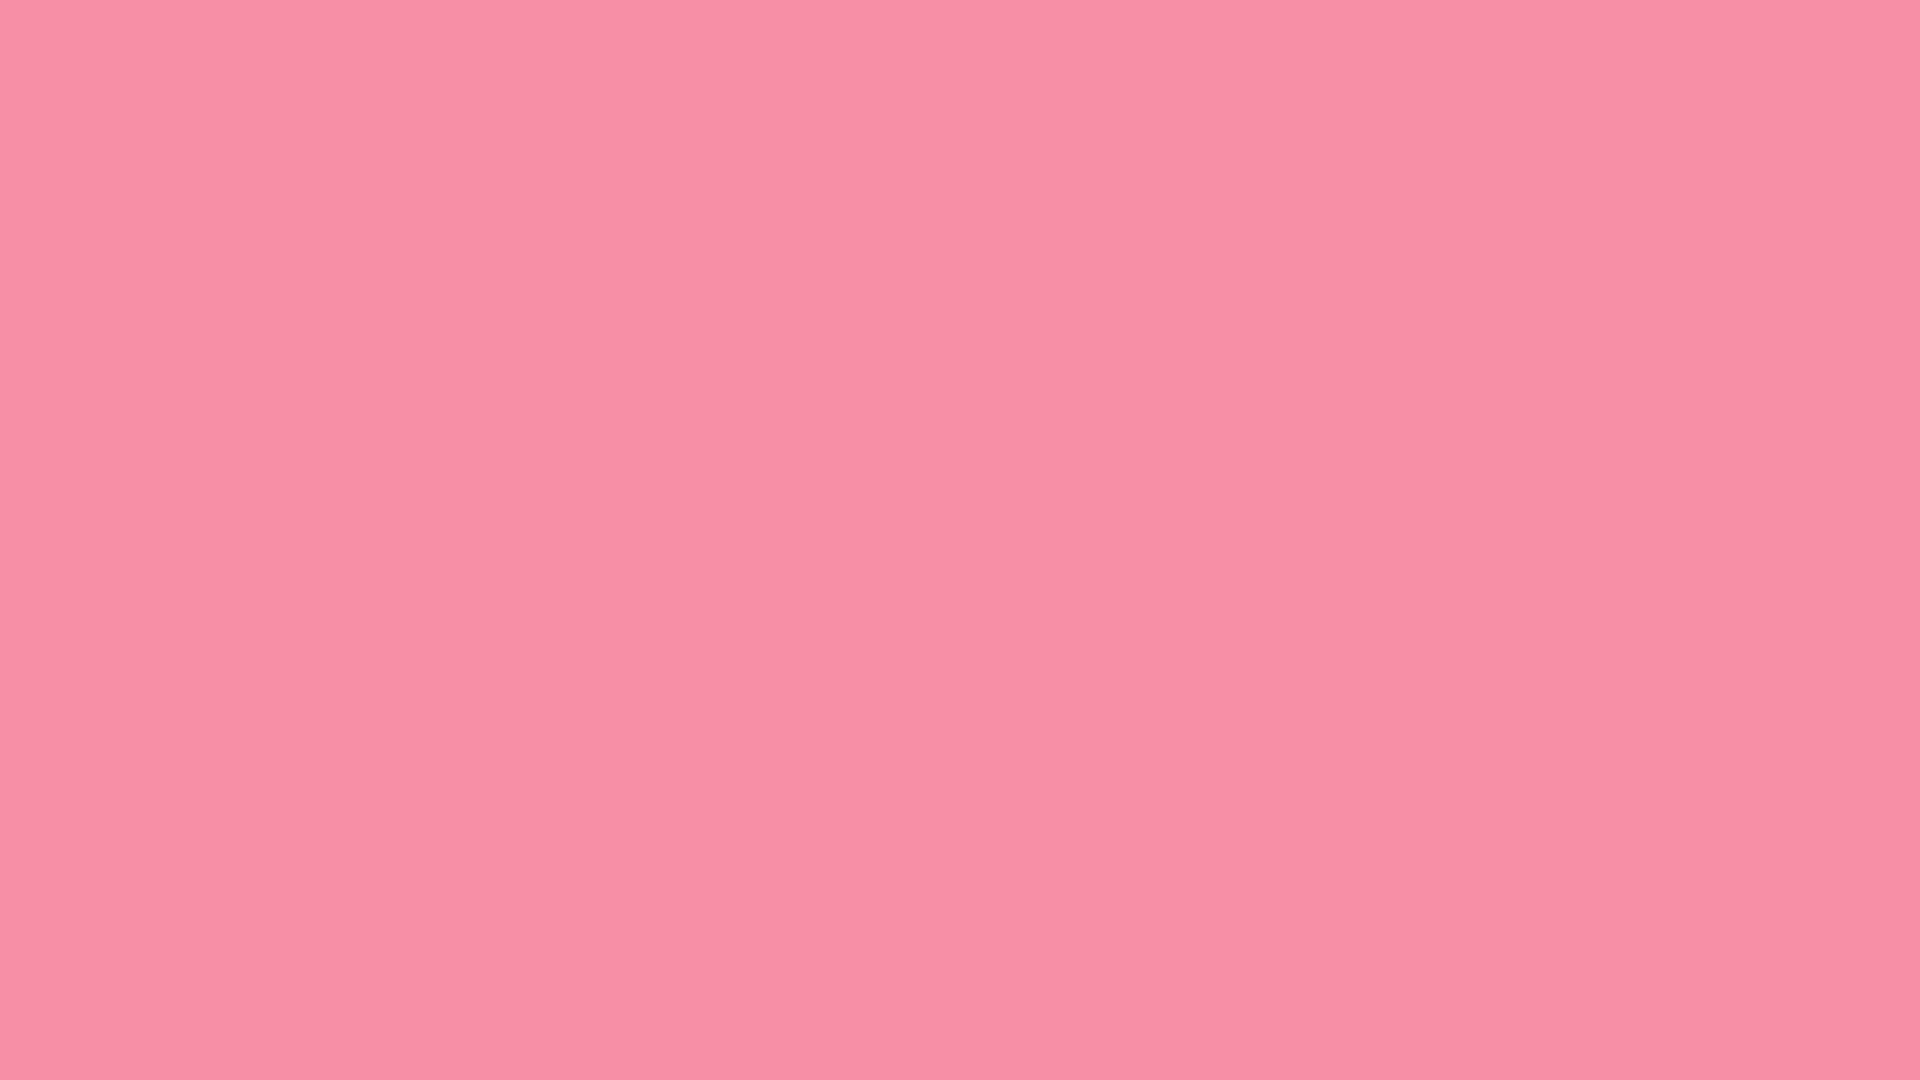 1920x1080 Pink Sherbet Solid Color Background